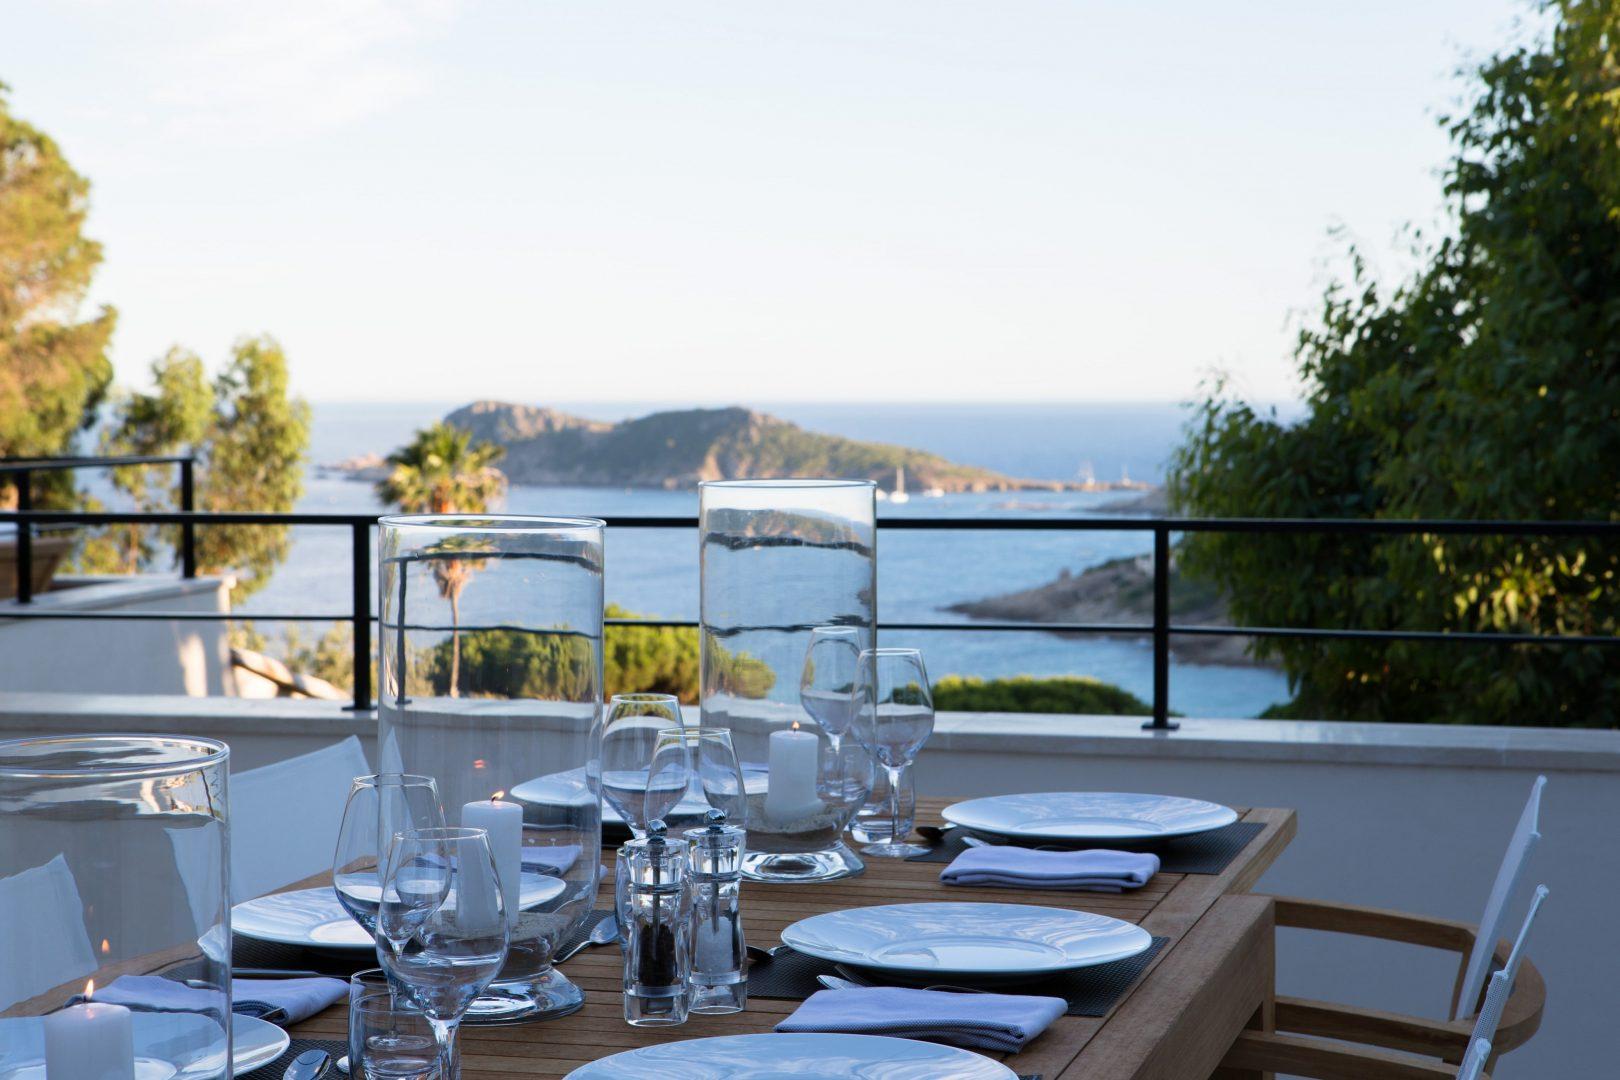 Luxury villa with sea views, sleeps 6, private pool, jacuzzi, pool house